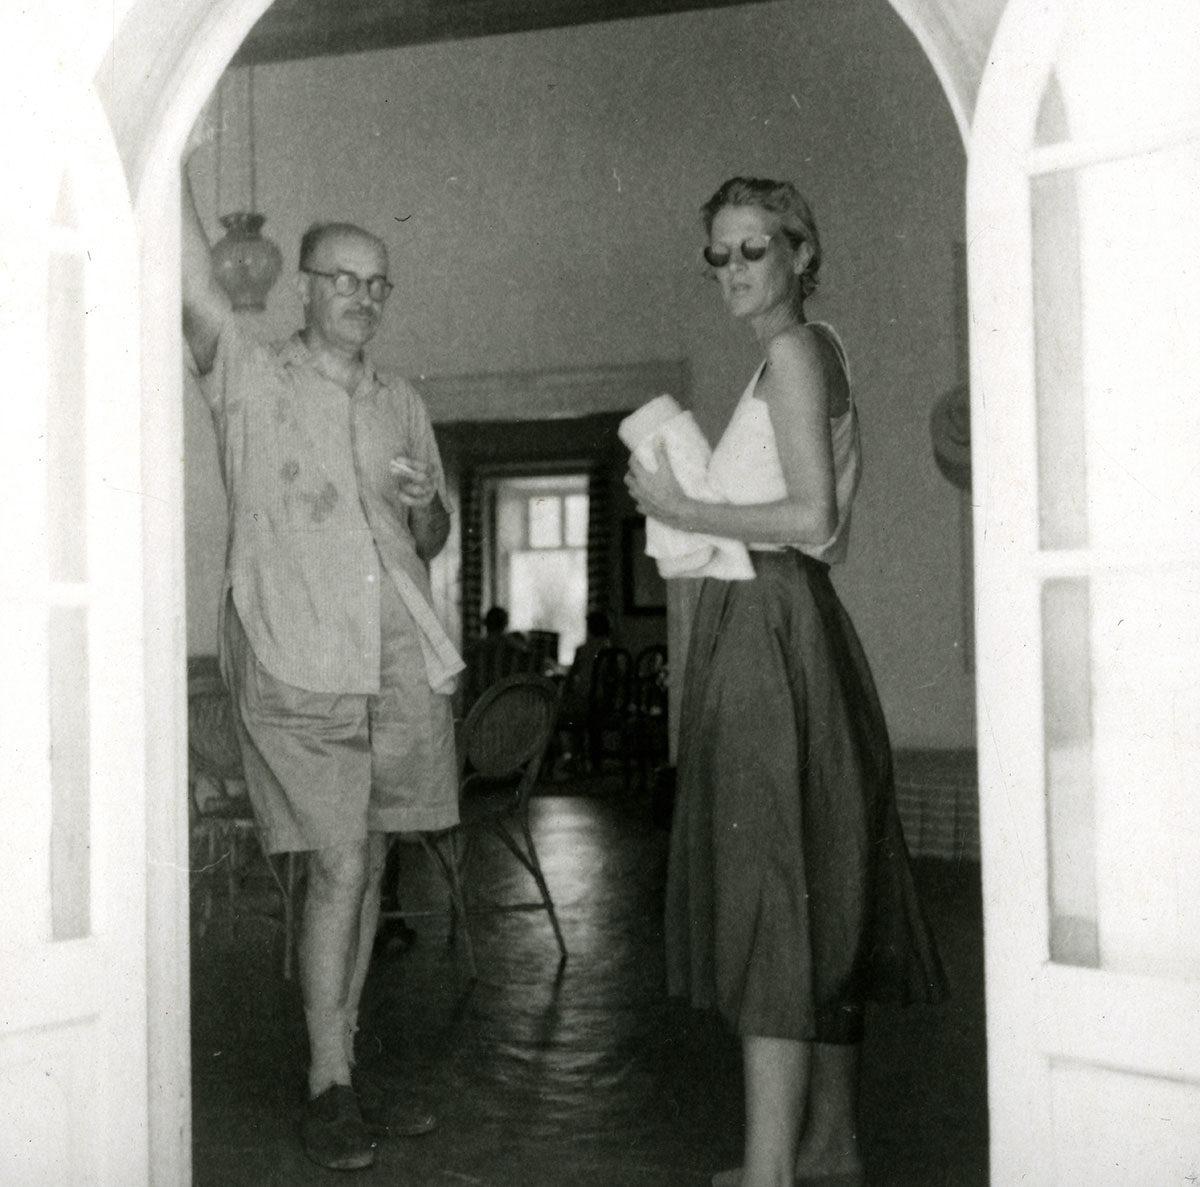 Nikos Hadjikyriakos-Ghika with Joan Leigh Fermor, Hydra 1955. © Benaki Museum / The Ghika Gallery, Photographic Archive